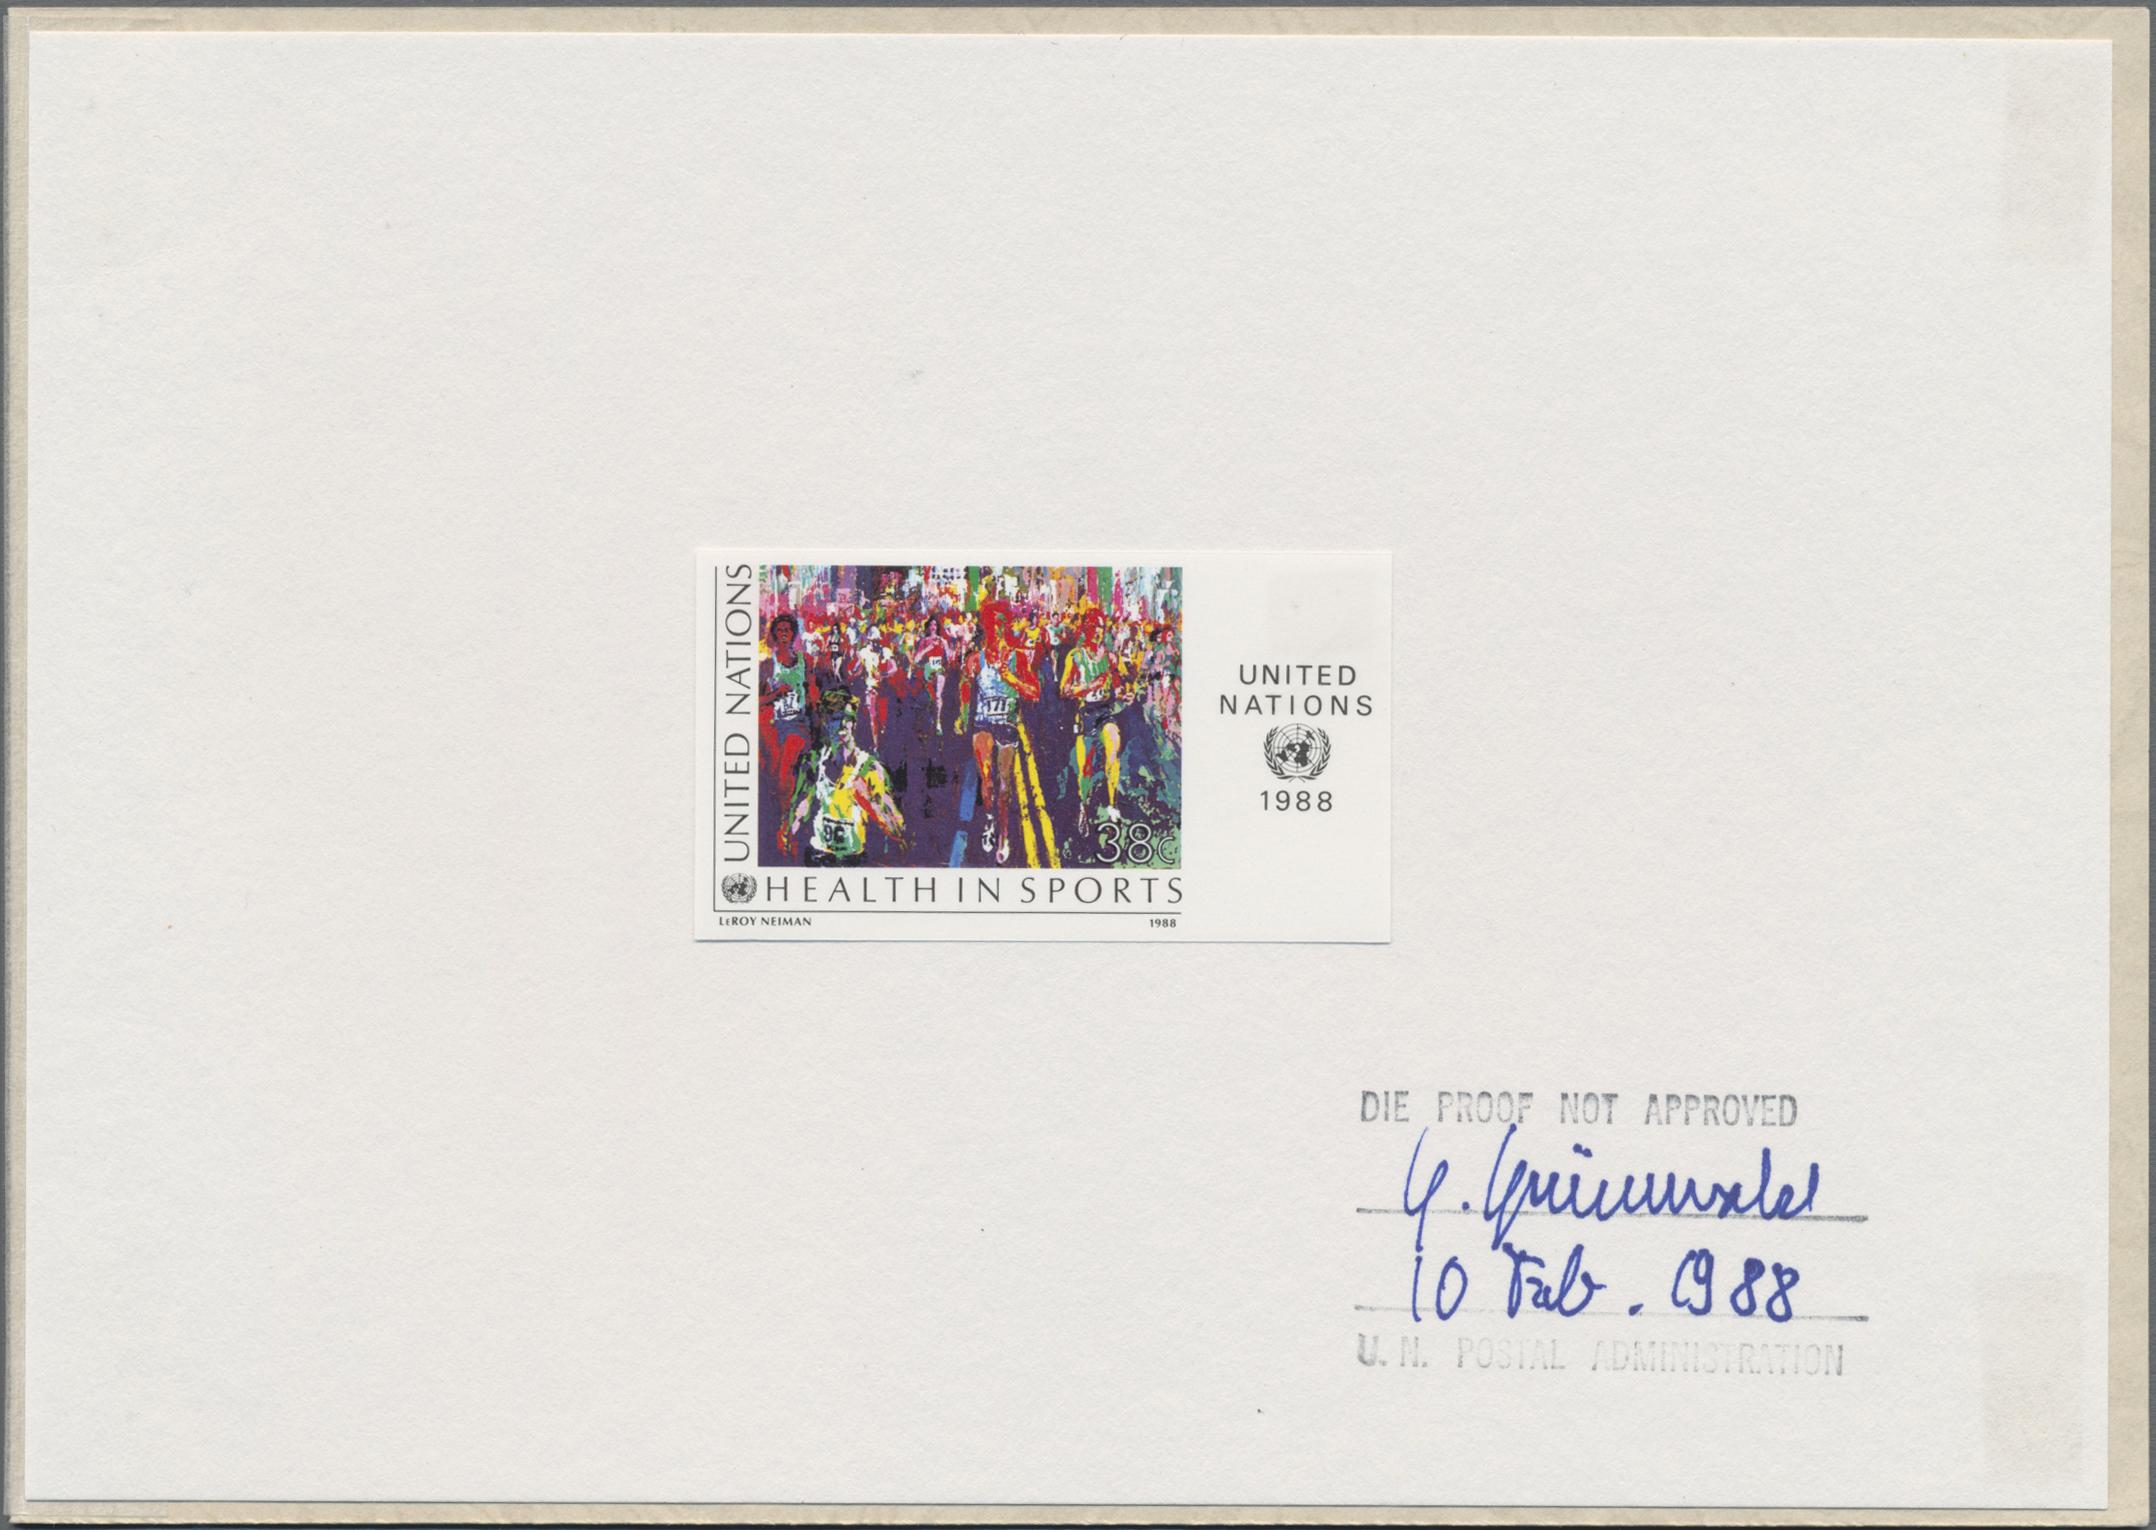 Lot 07802 - Vereinte Nationen - New York  -  Auktionshaus Christoph Gärtner GmbH & Co. KG Sale #48 The Single Lots Philatelie